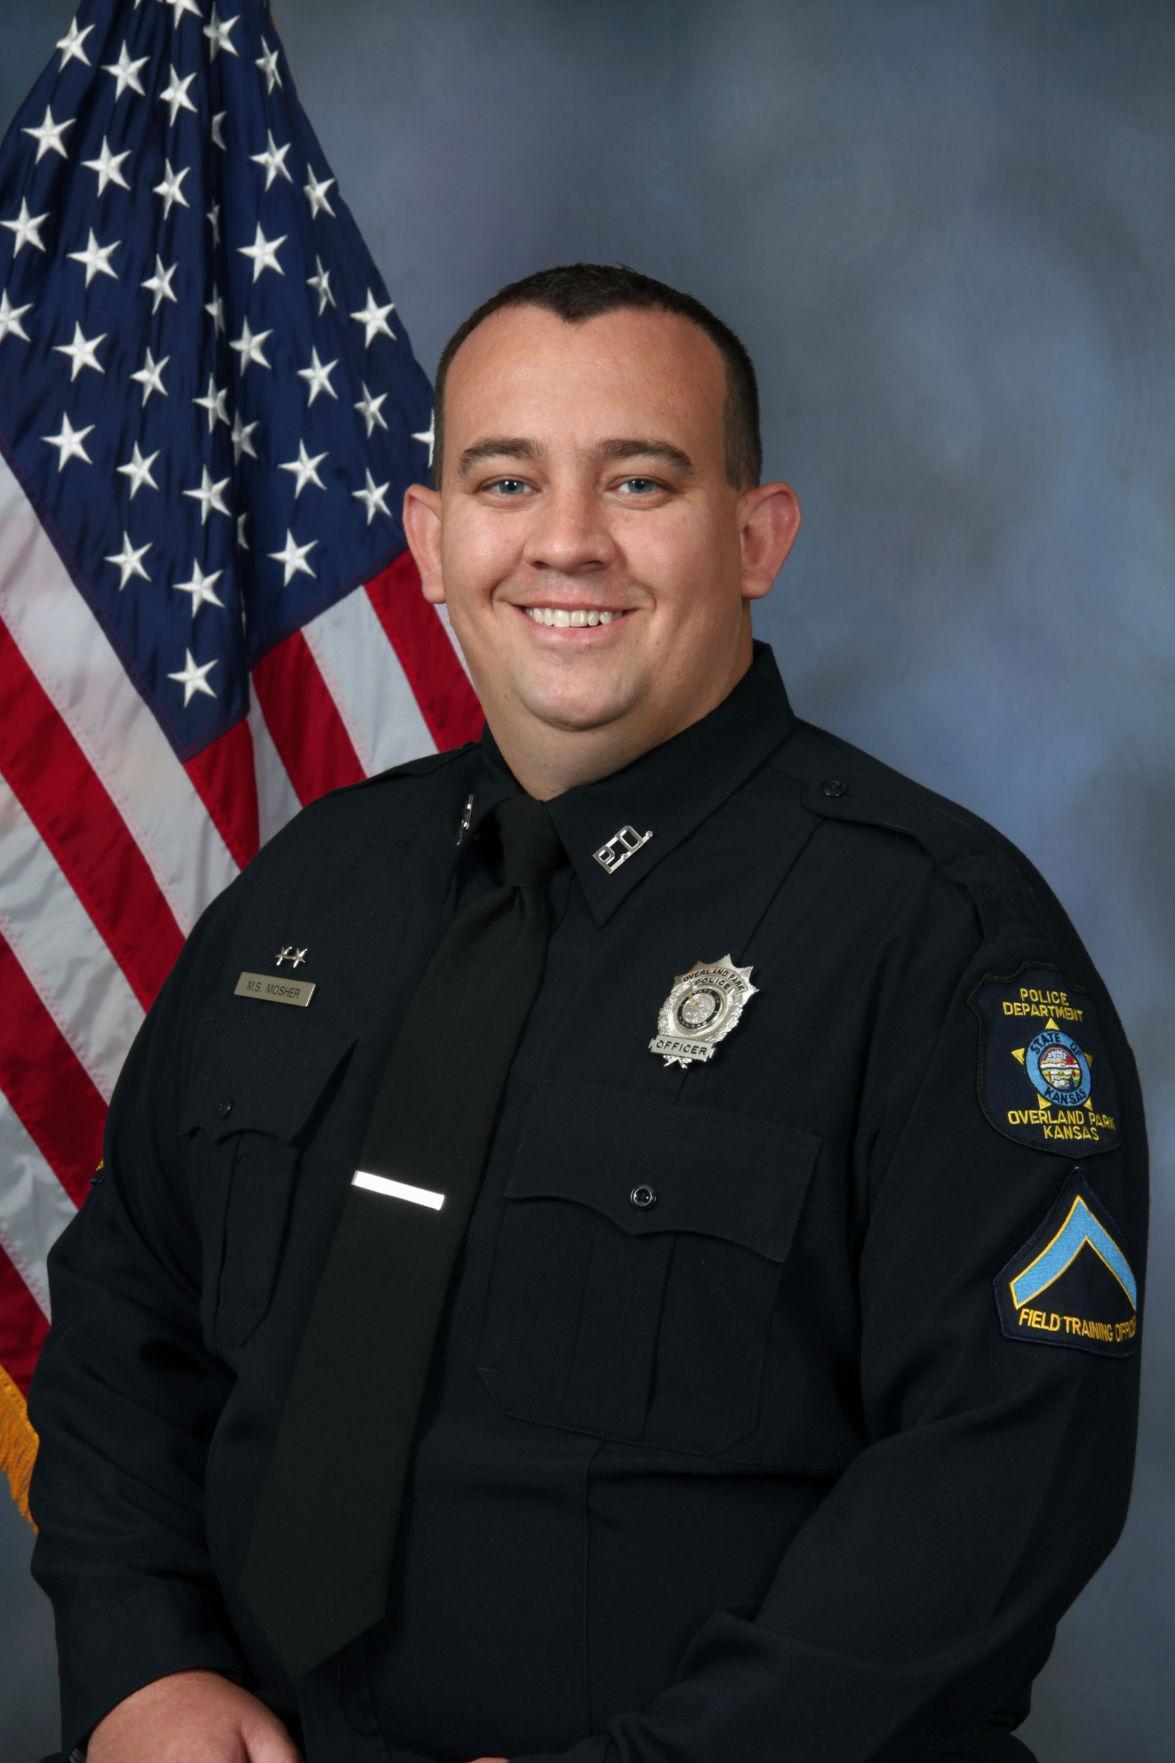 Police Officer Michael S. Mosher | Overland Park Police Department, Kansas